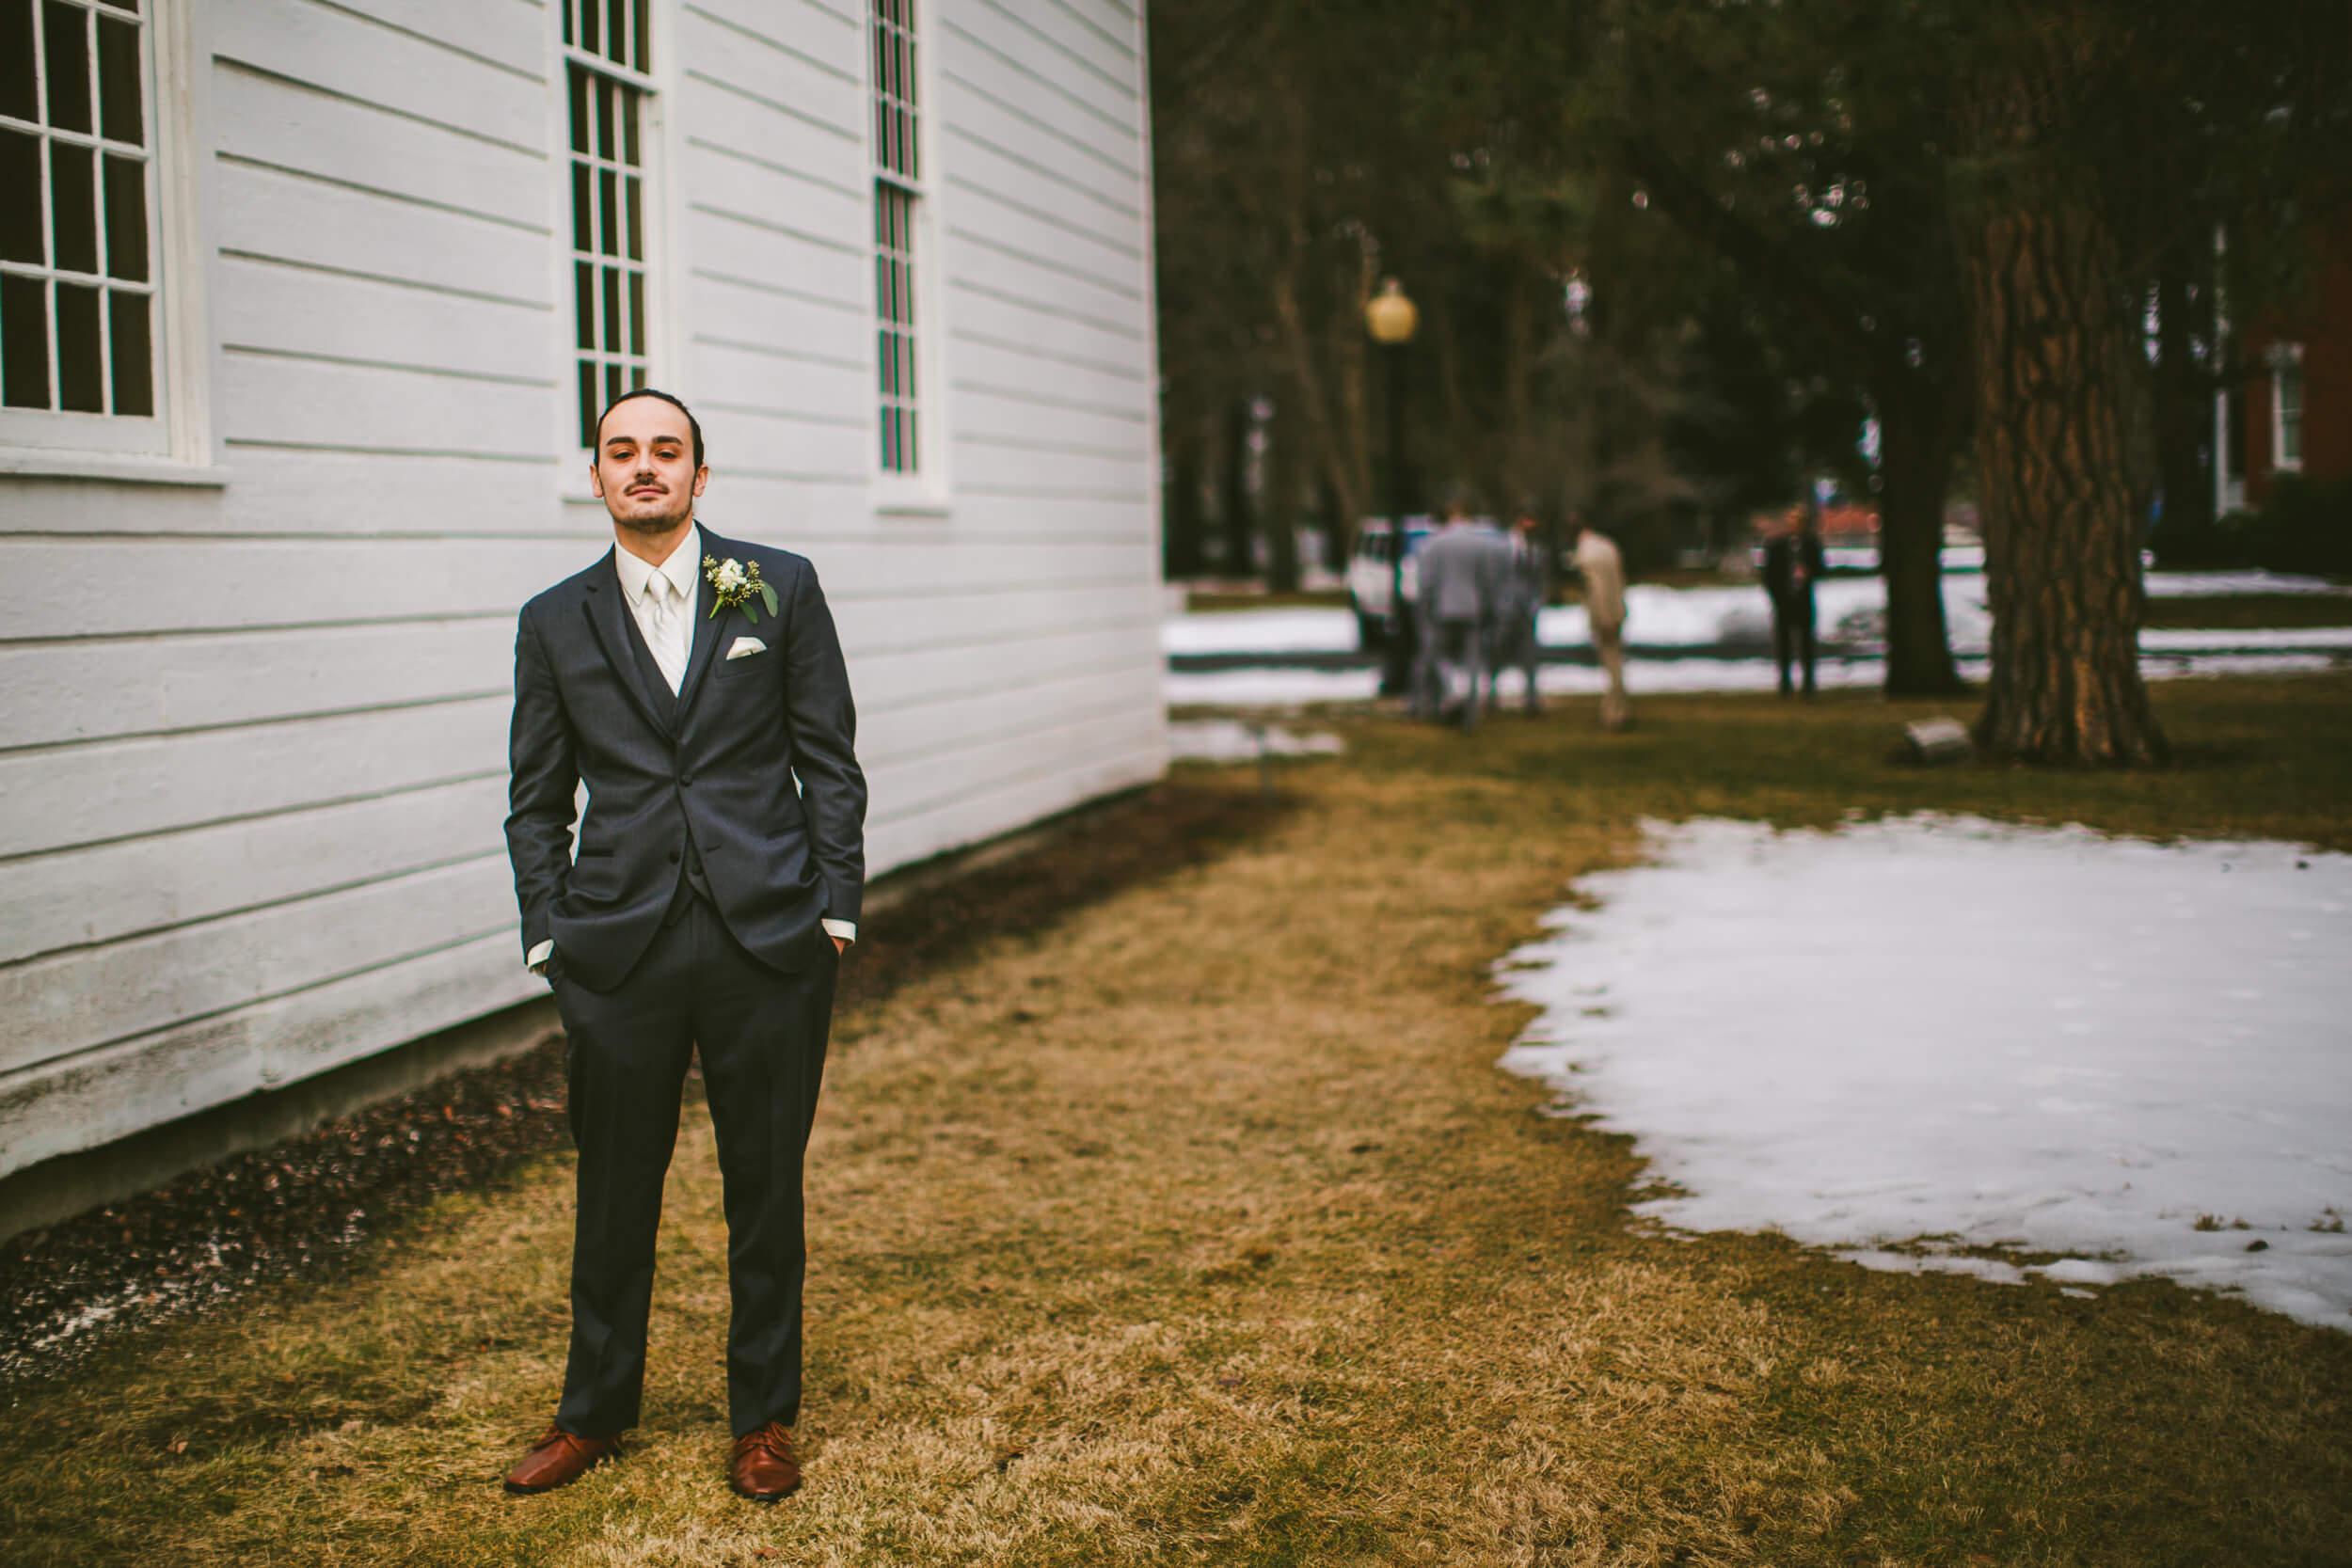 mukogawa winter wedding in spokane (55).jpg